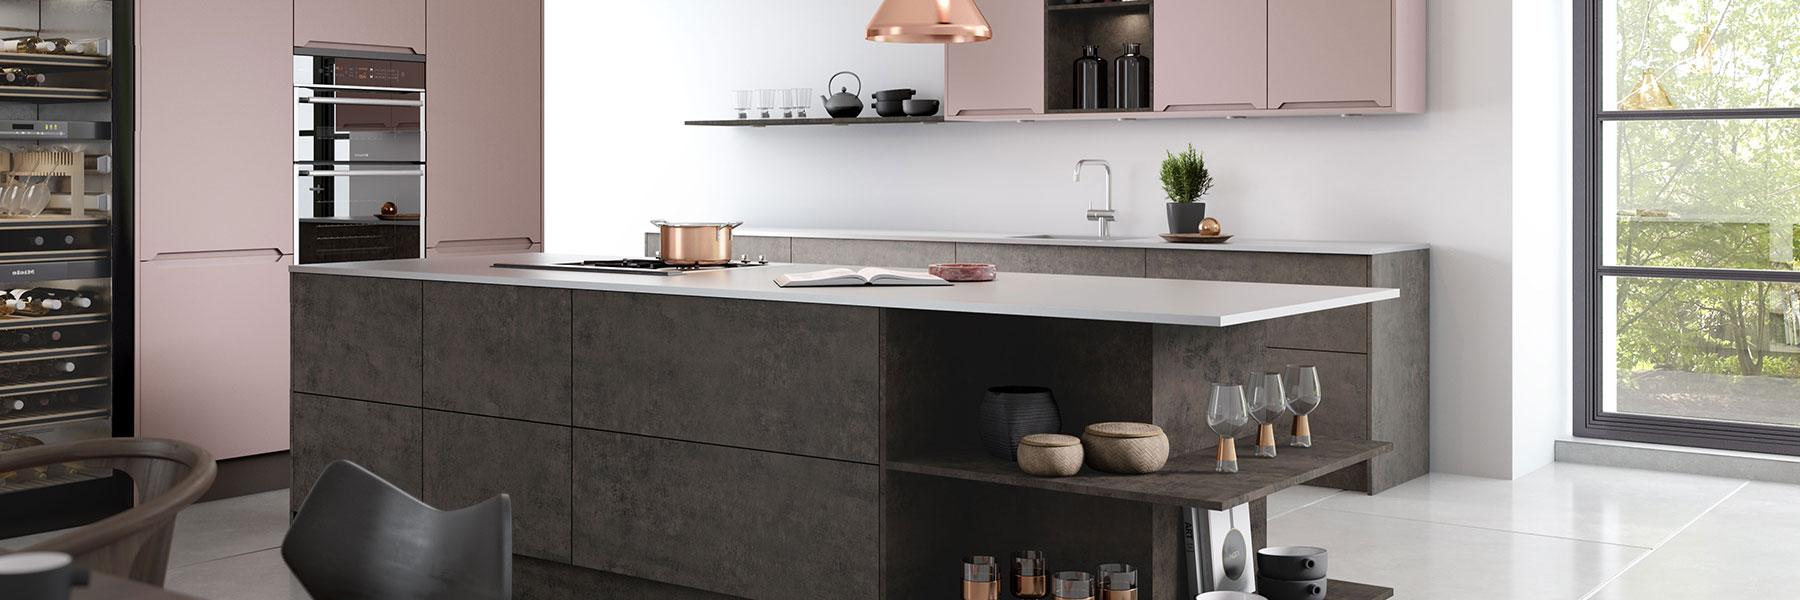 Designer Kitchens Lancashire